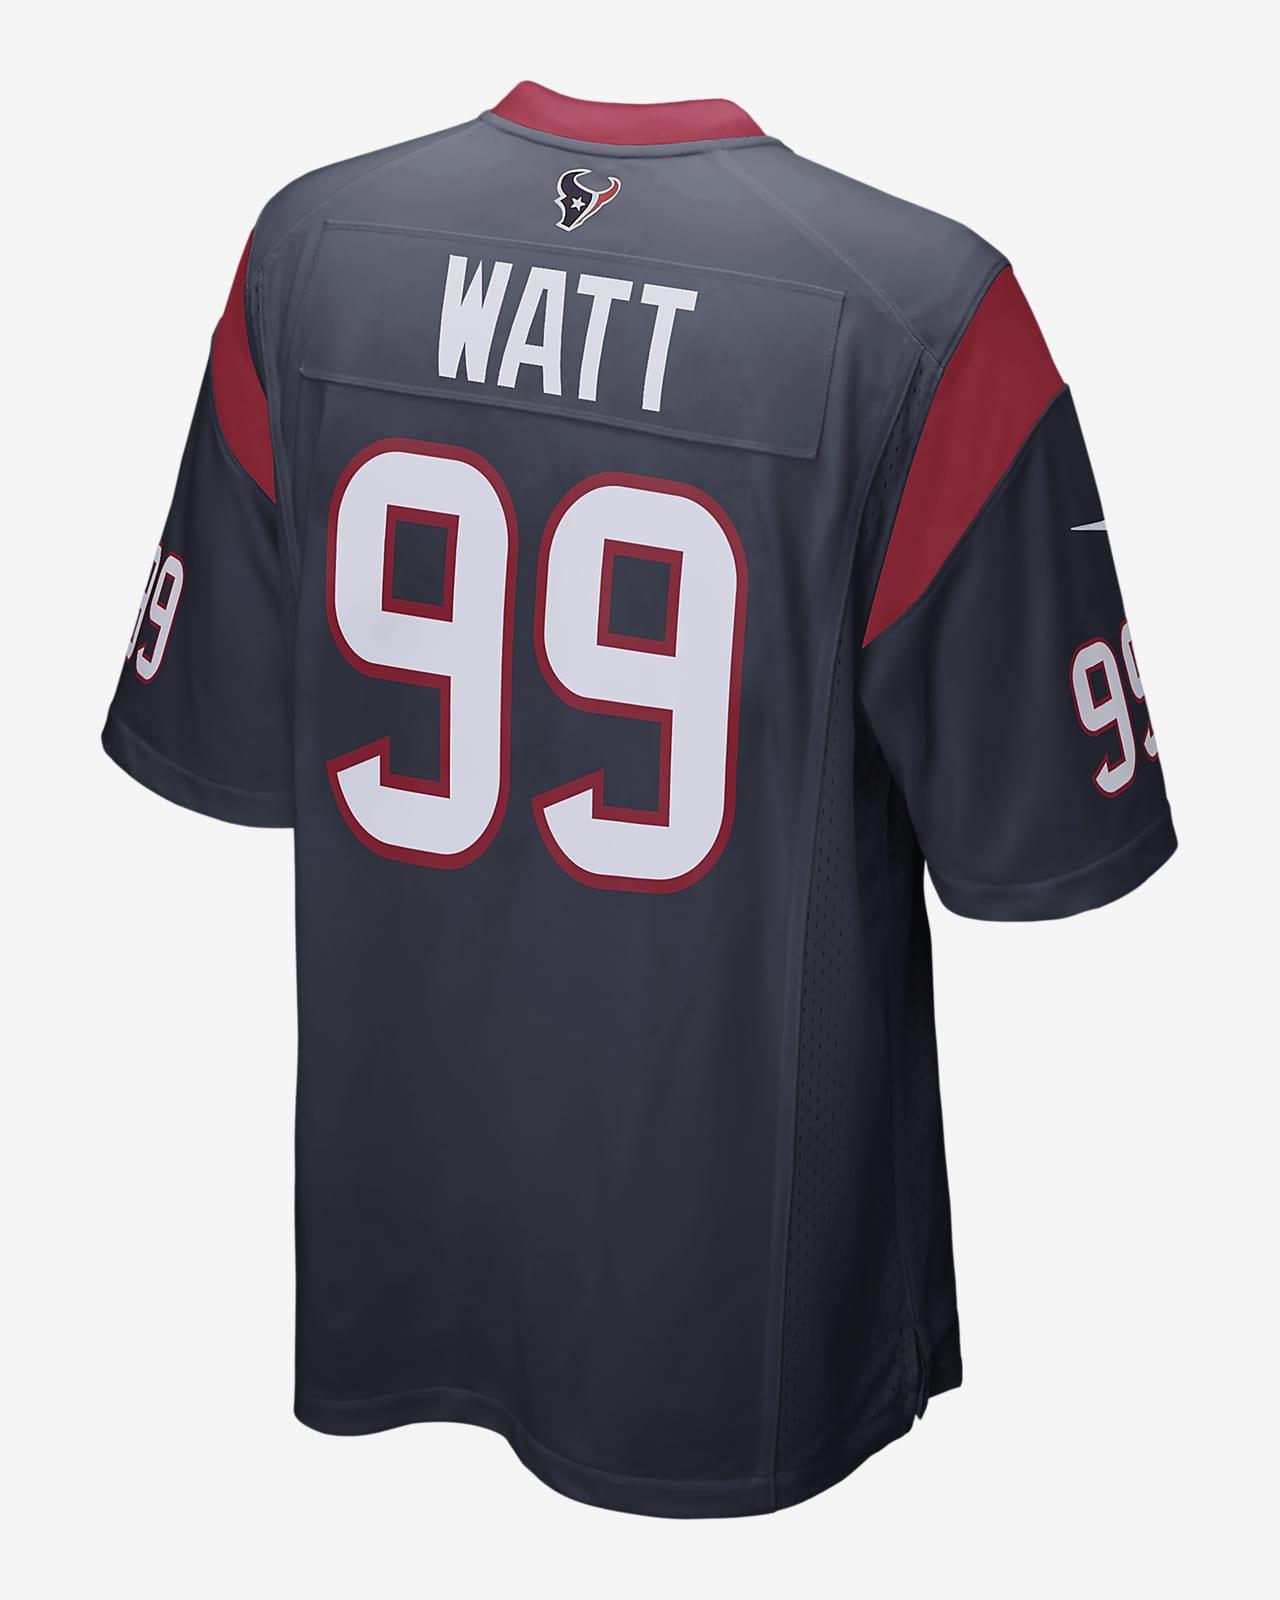 NFL Houston Texans (J.J. Watt) Men's Game Football Jersey